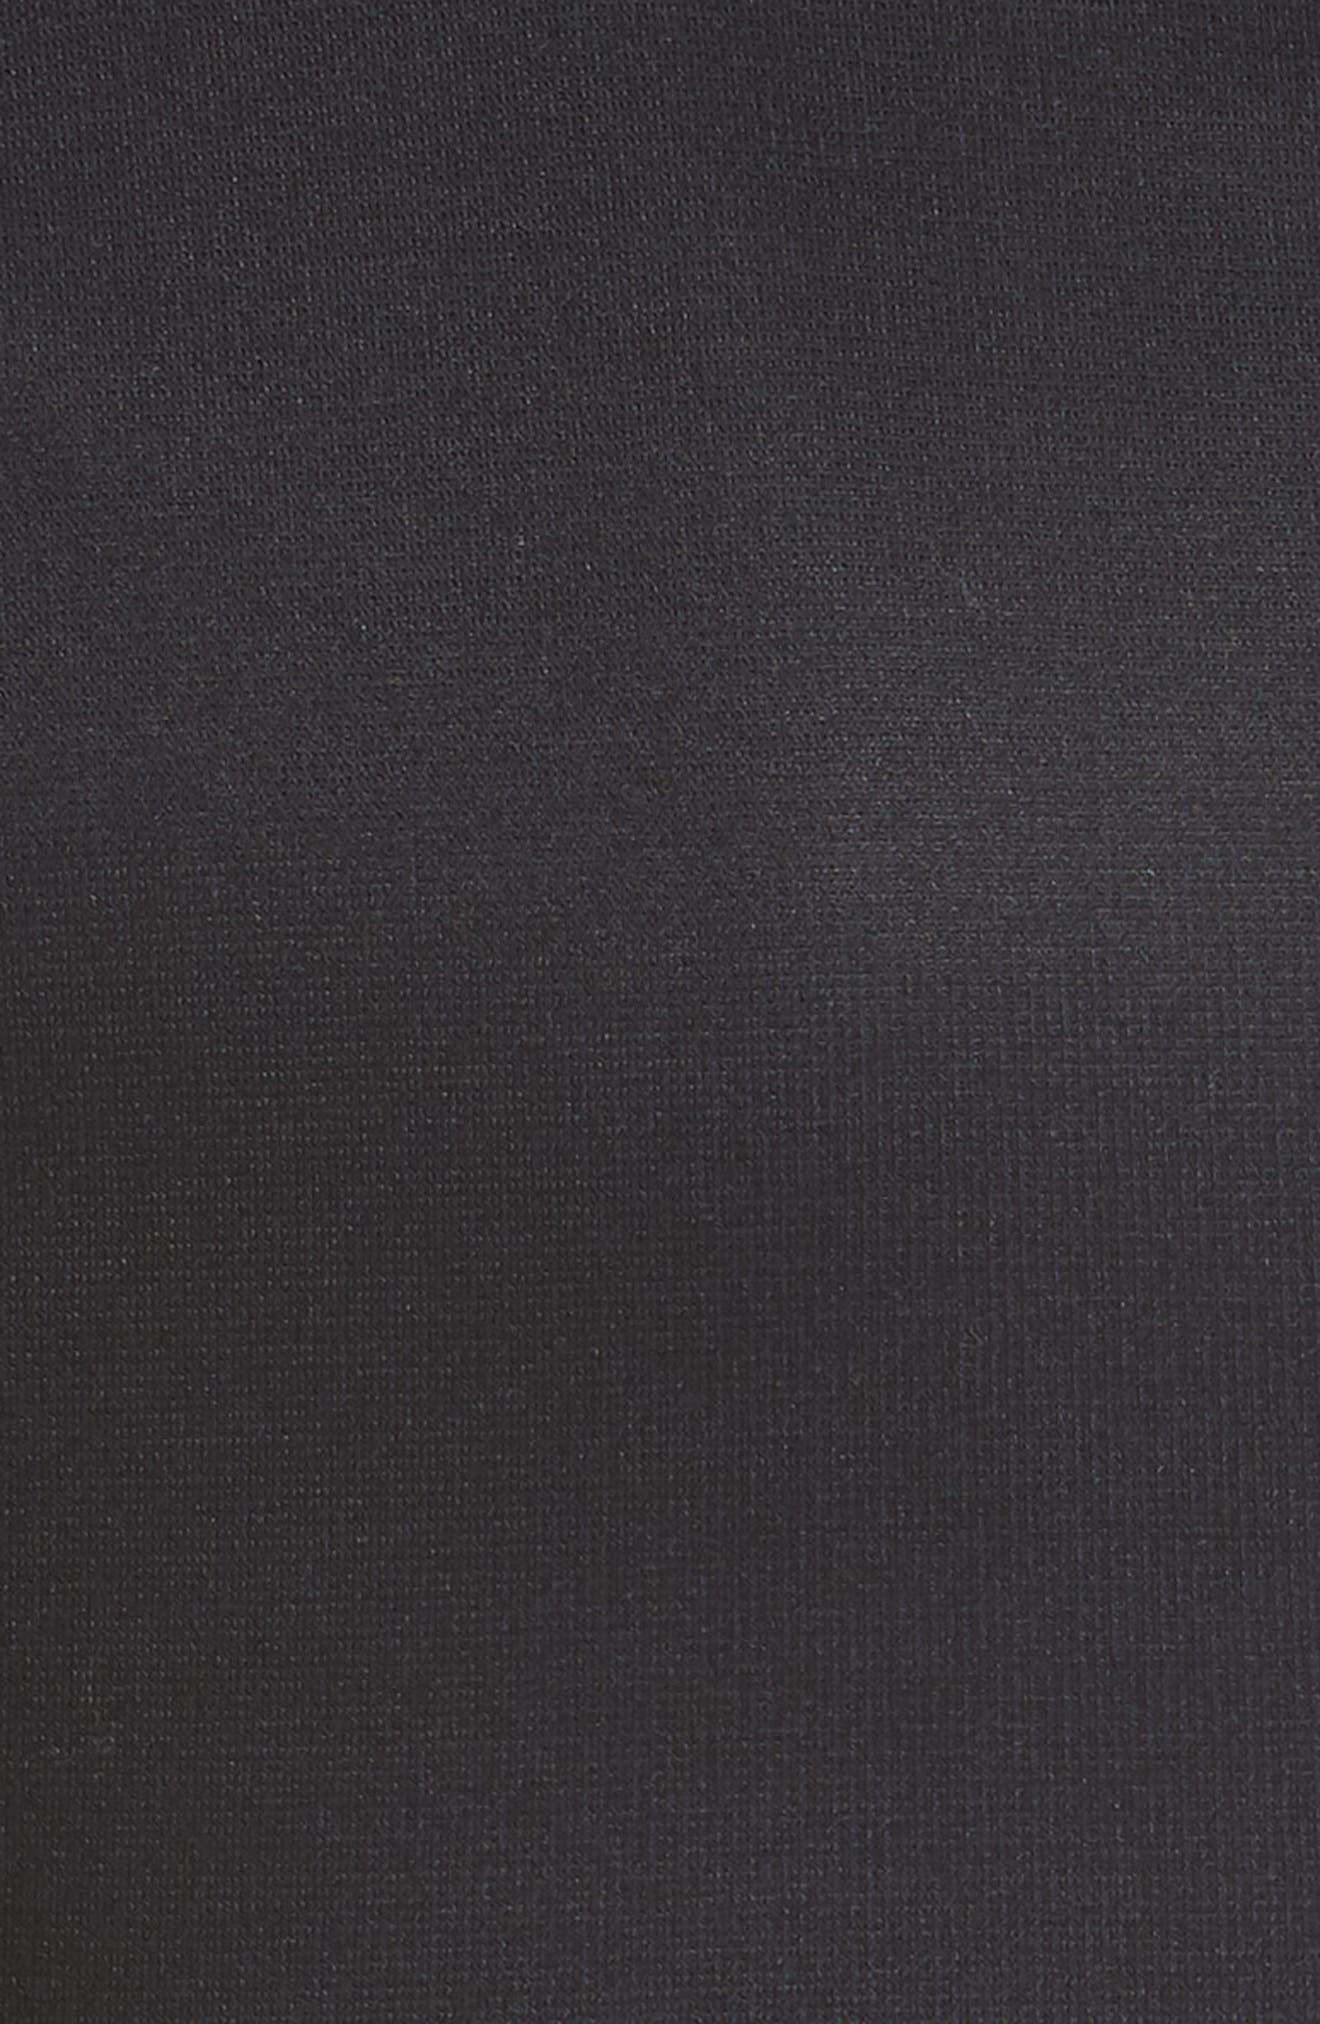 TED BAKER LONDON,                             Dollila Pirouette Body-Con Midi Dress,                             Alternate thumbnail 6, color,                             001